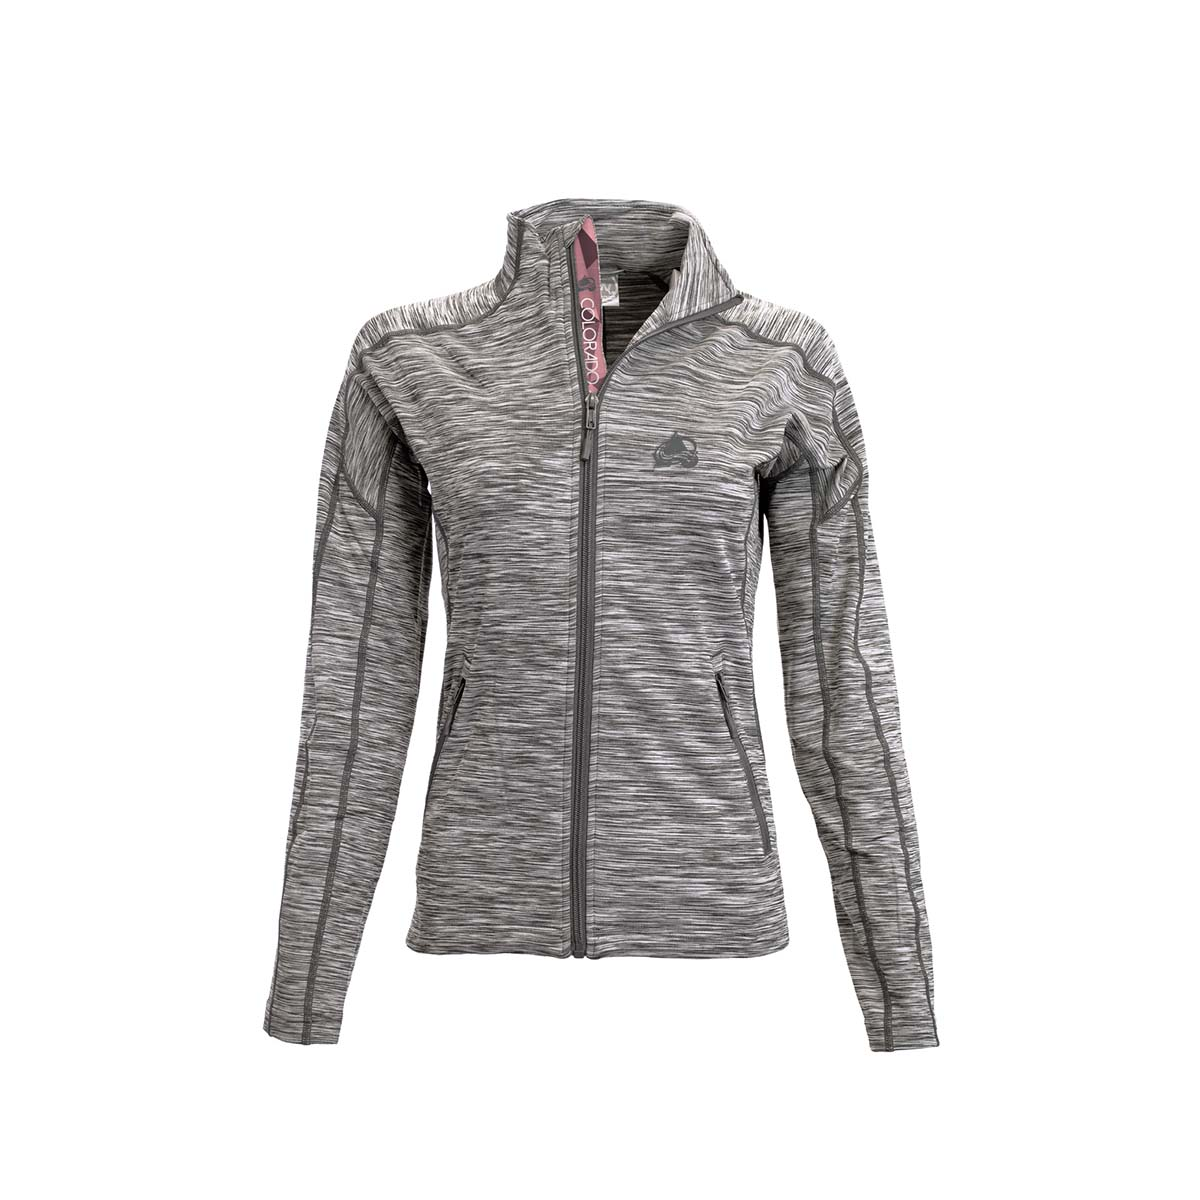 Colorado Avalanche Womens Diamond Type Atlantis Jacket (Charcoal) by Levelwear